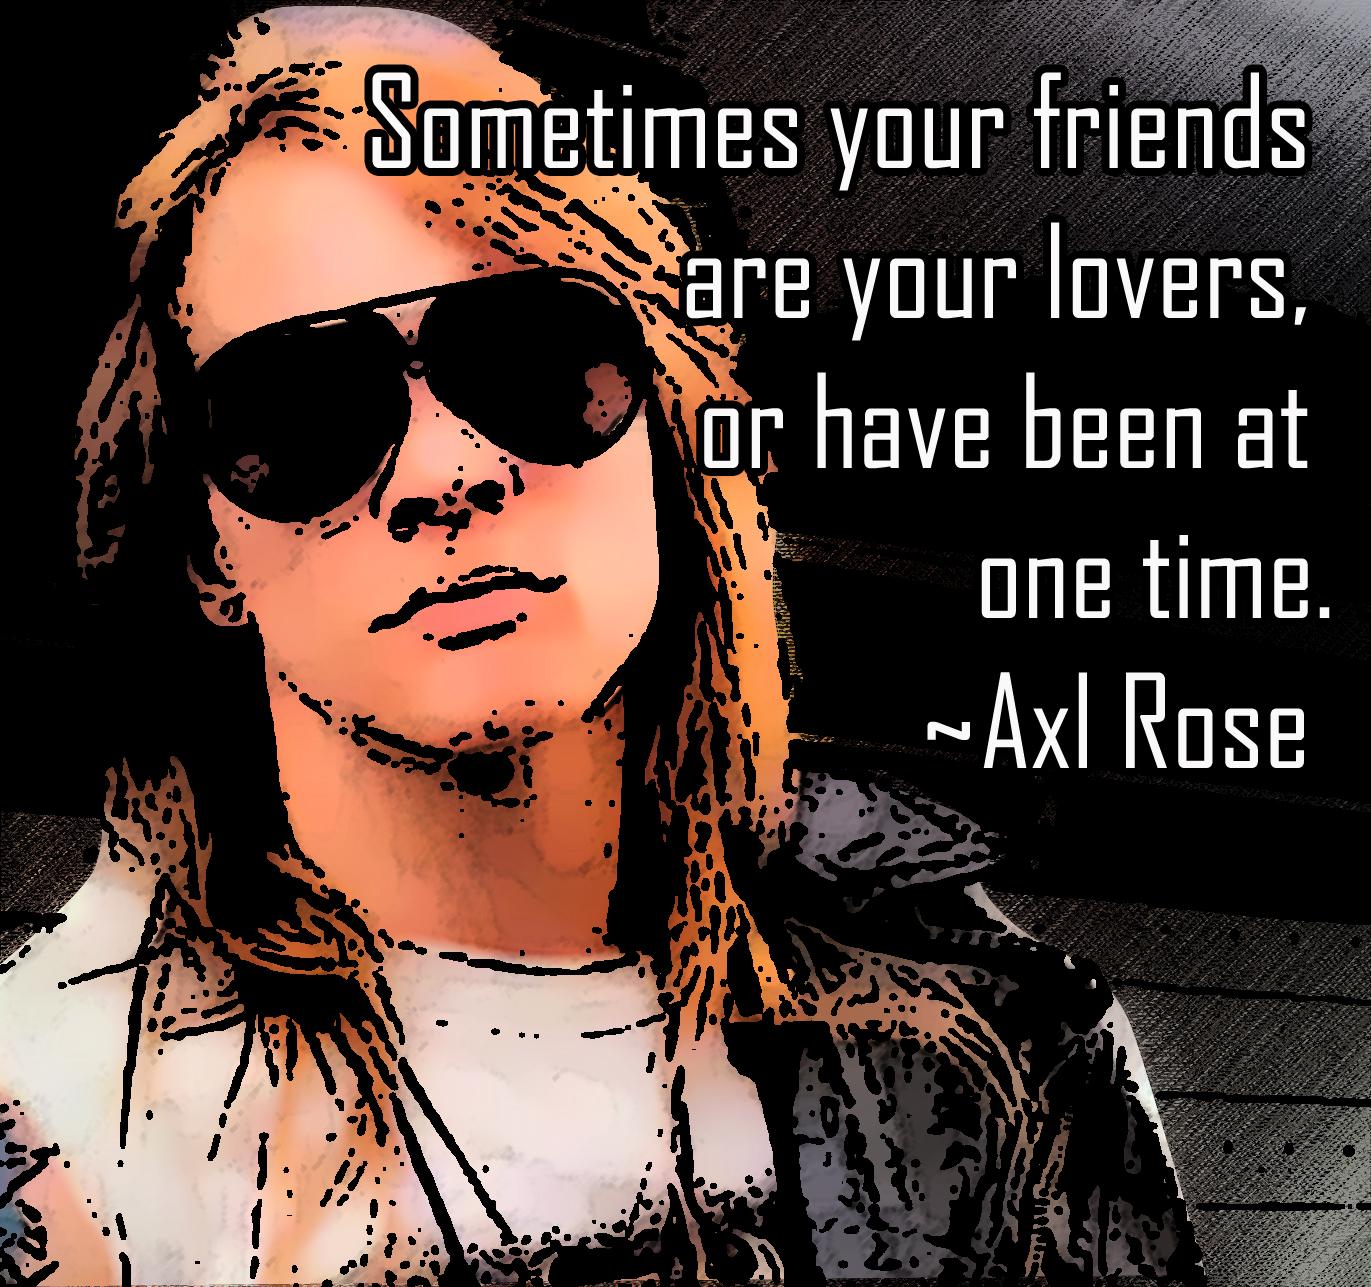 Axl Rose's quote #1